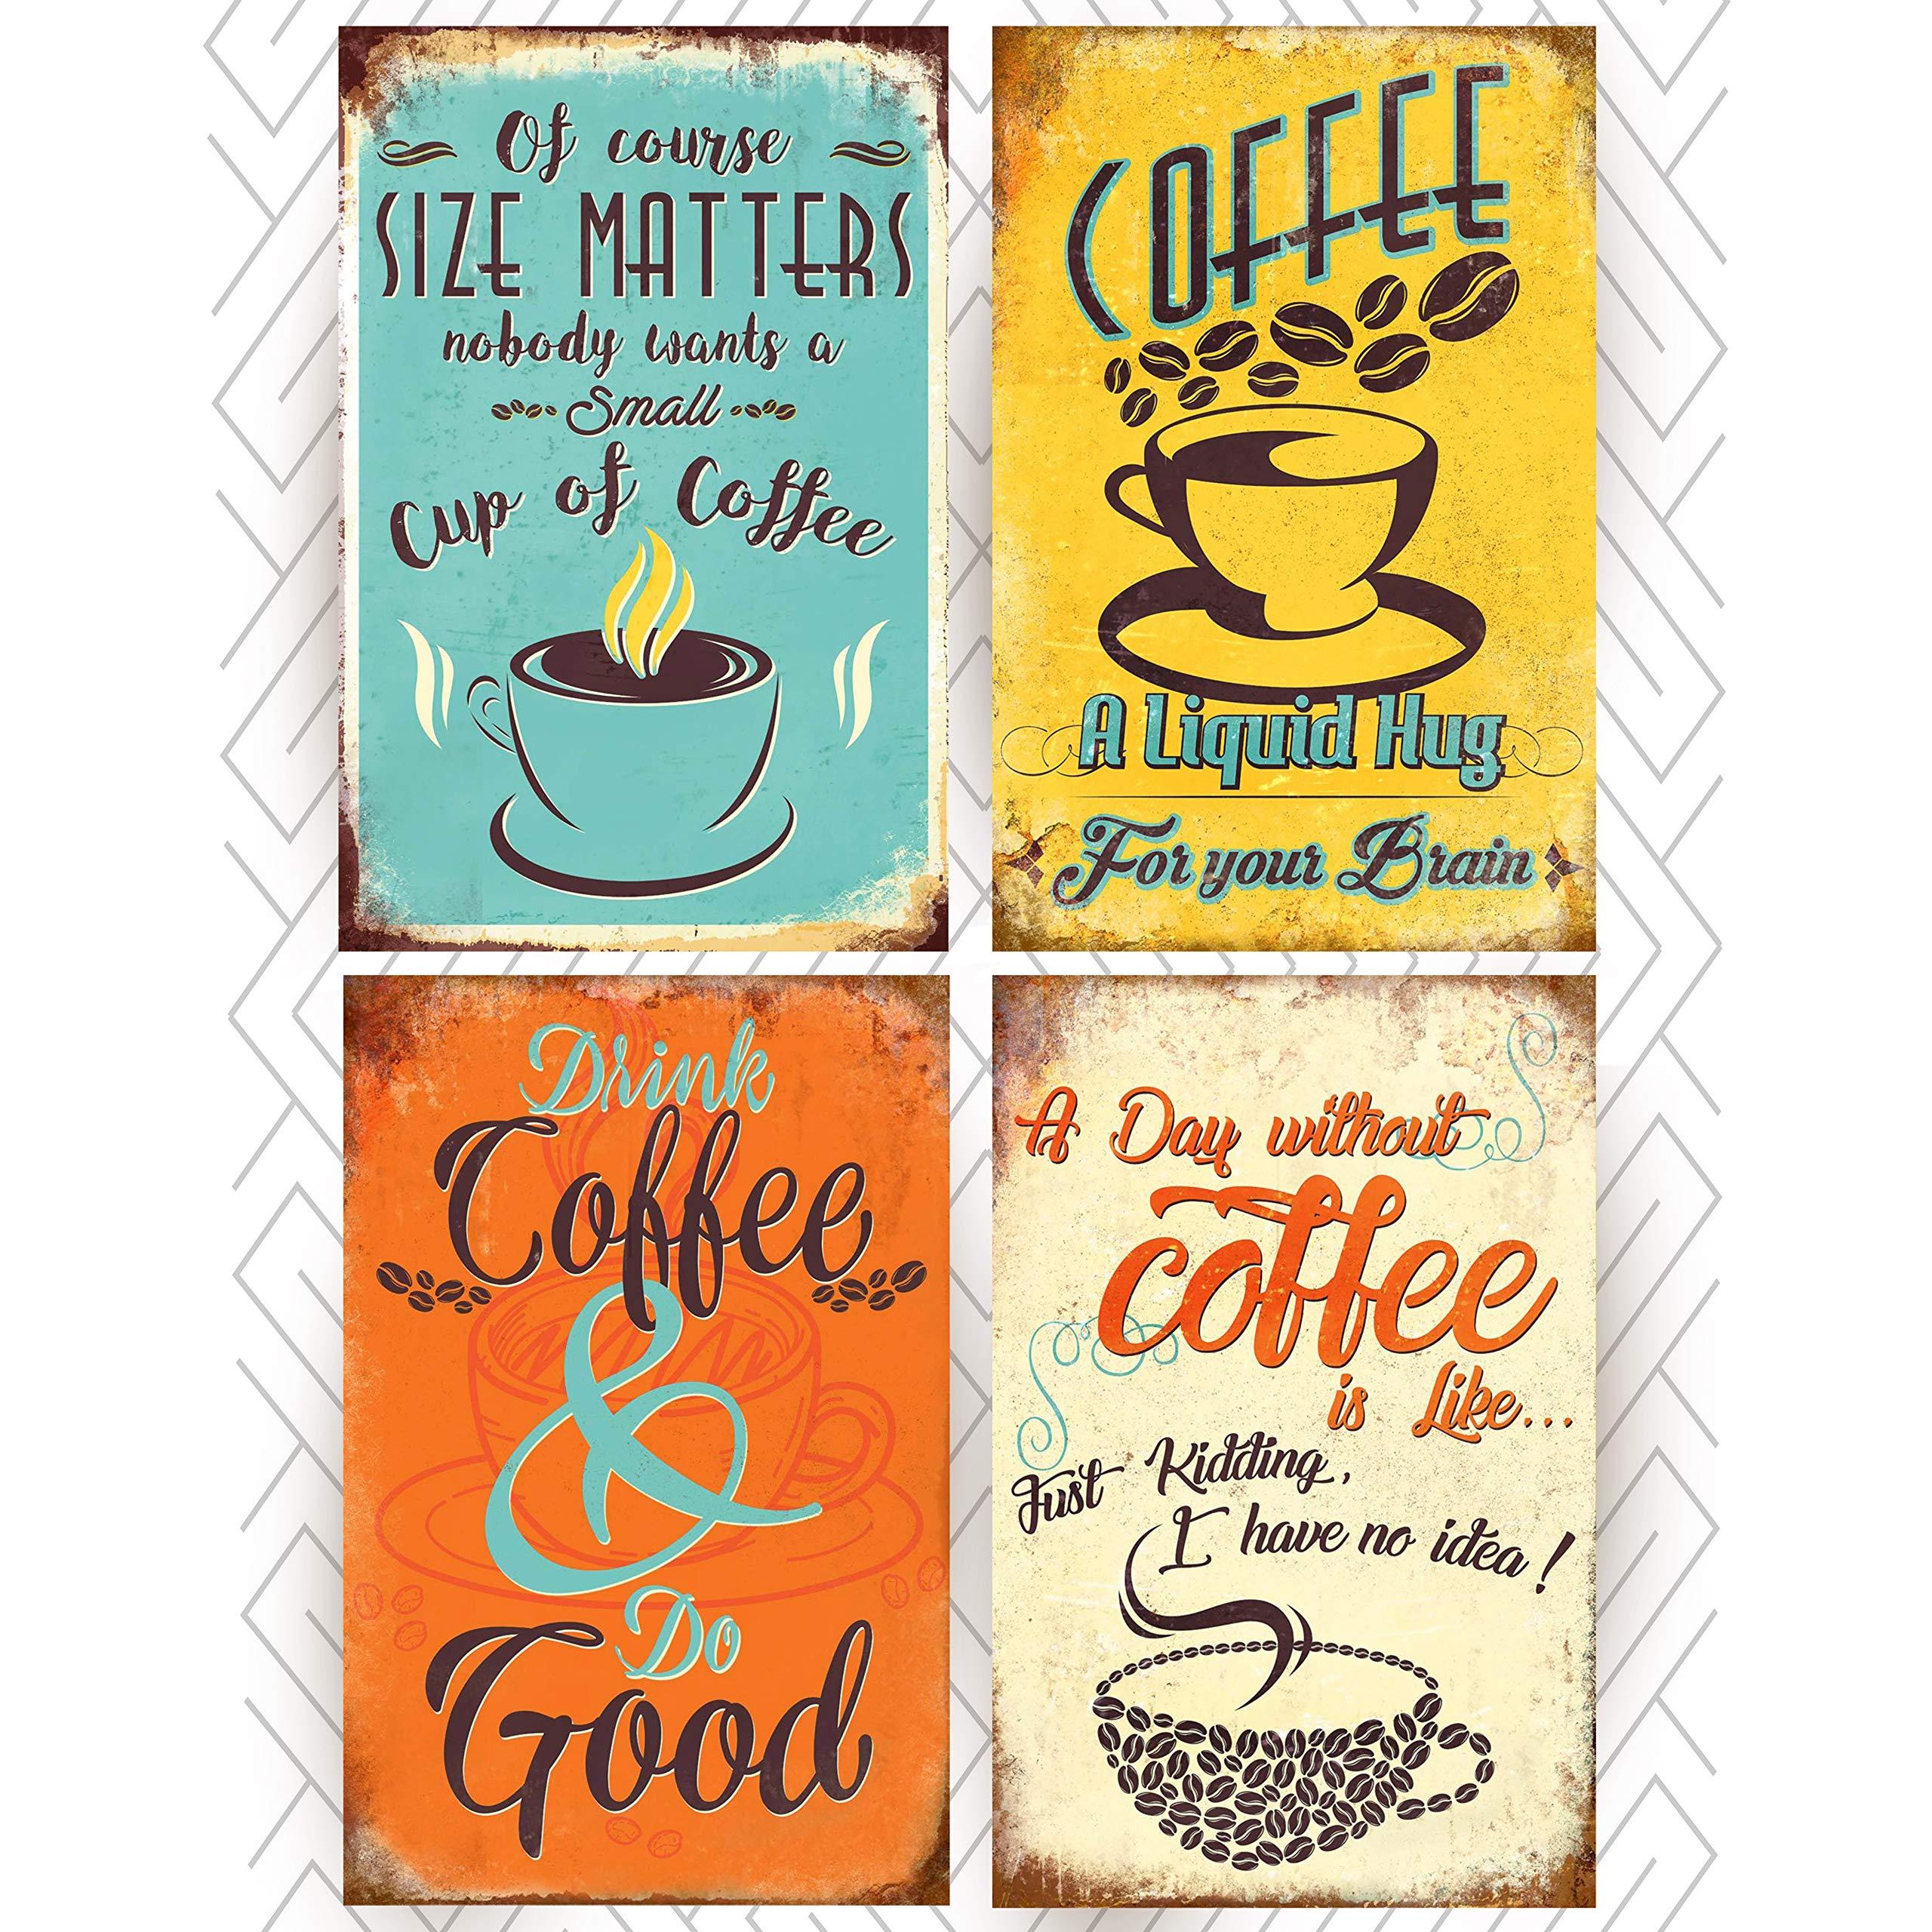 Amazon.com: Coffee Sign Shop Posters Prints (OFFSET PAPER ...